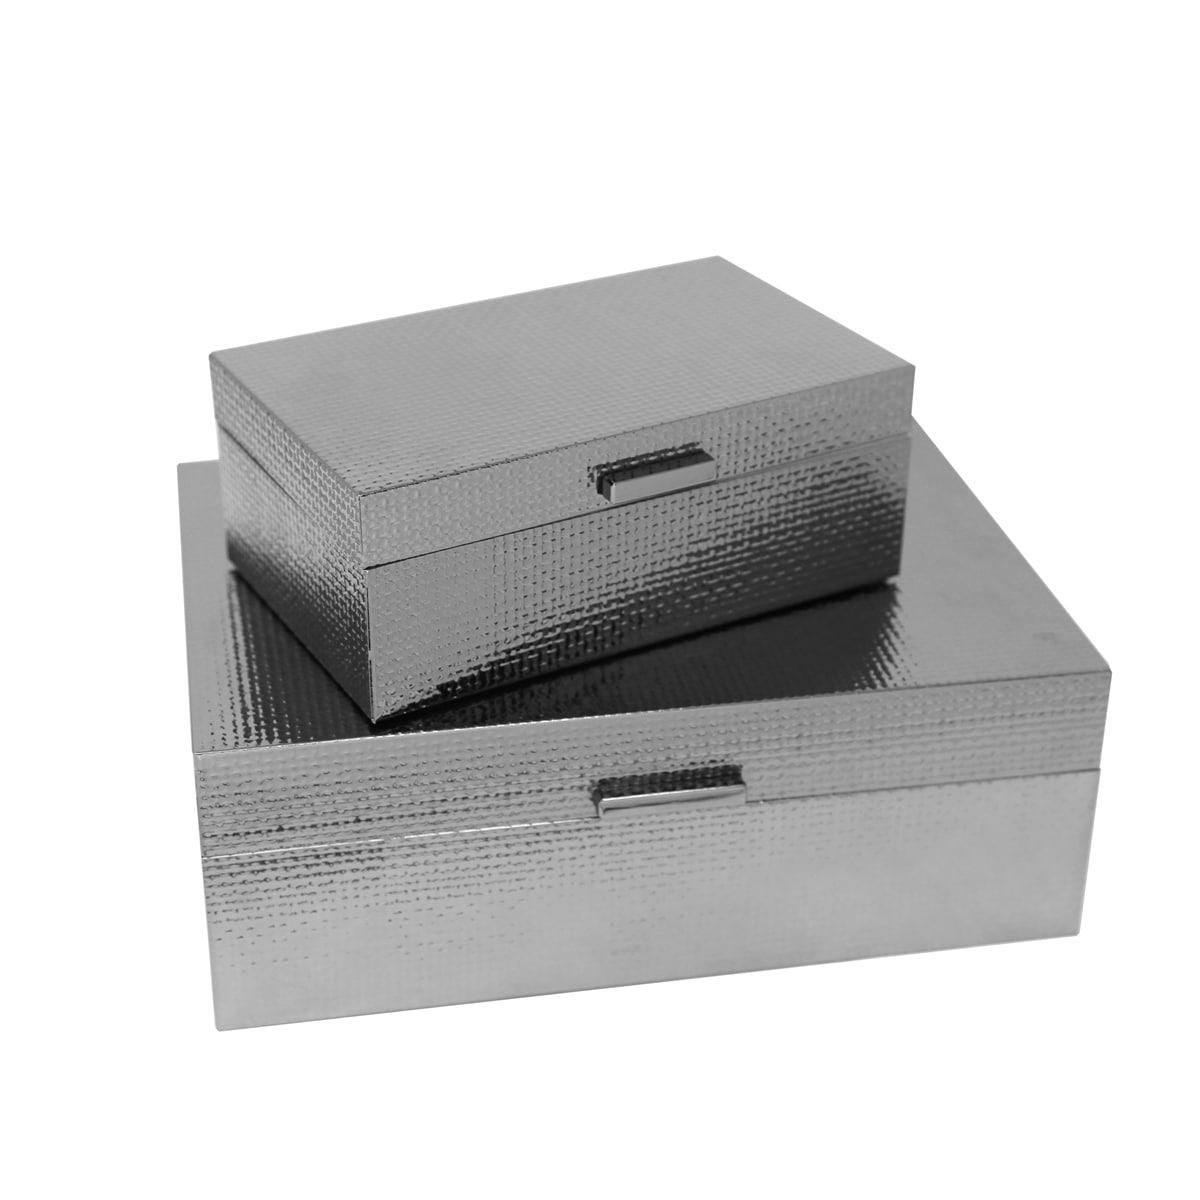 Shop Sagebrook Home 13202 03 Metal Wood Storage Boxes Gun Metal Mdf Glass 11 75 X 8 25 X 4 25 Inches Set Of 2 Overstock 21336382